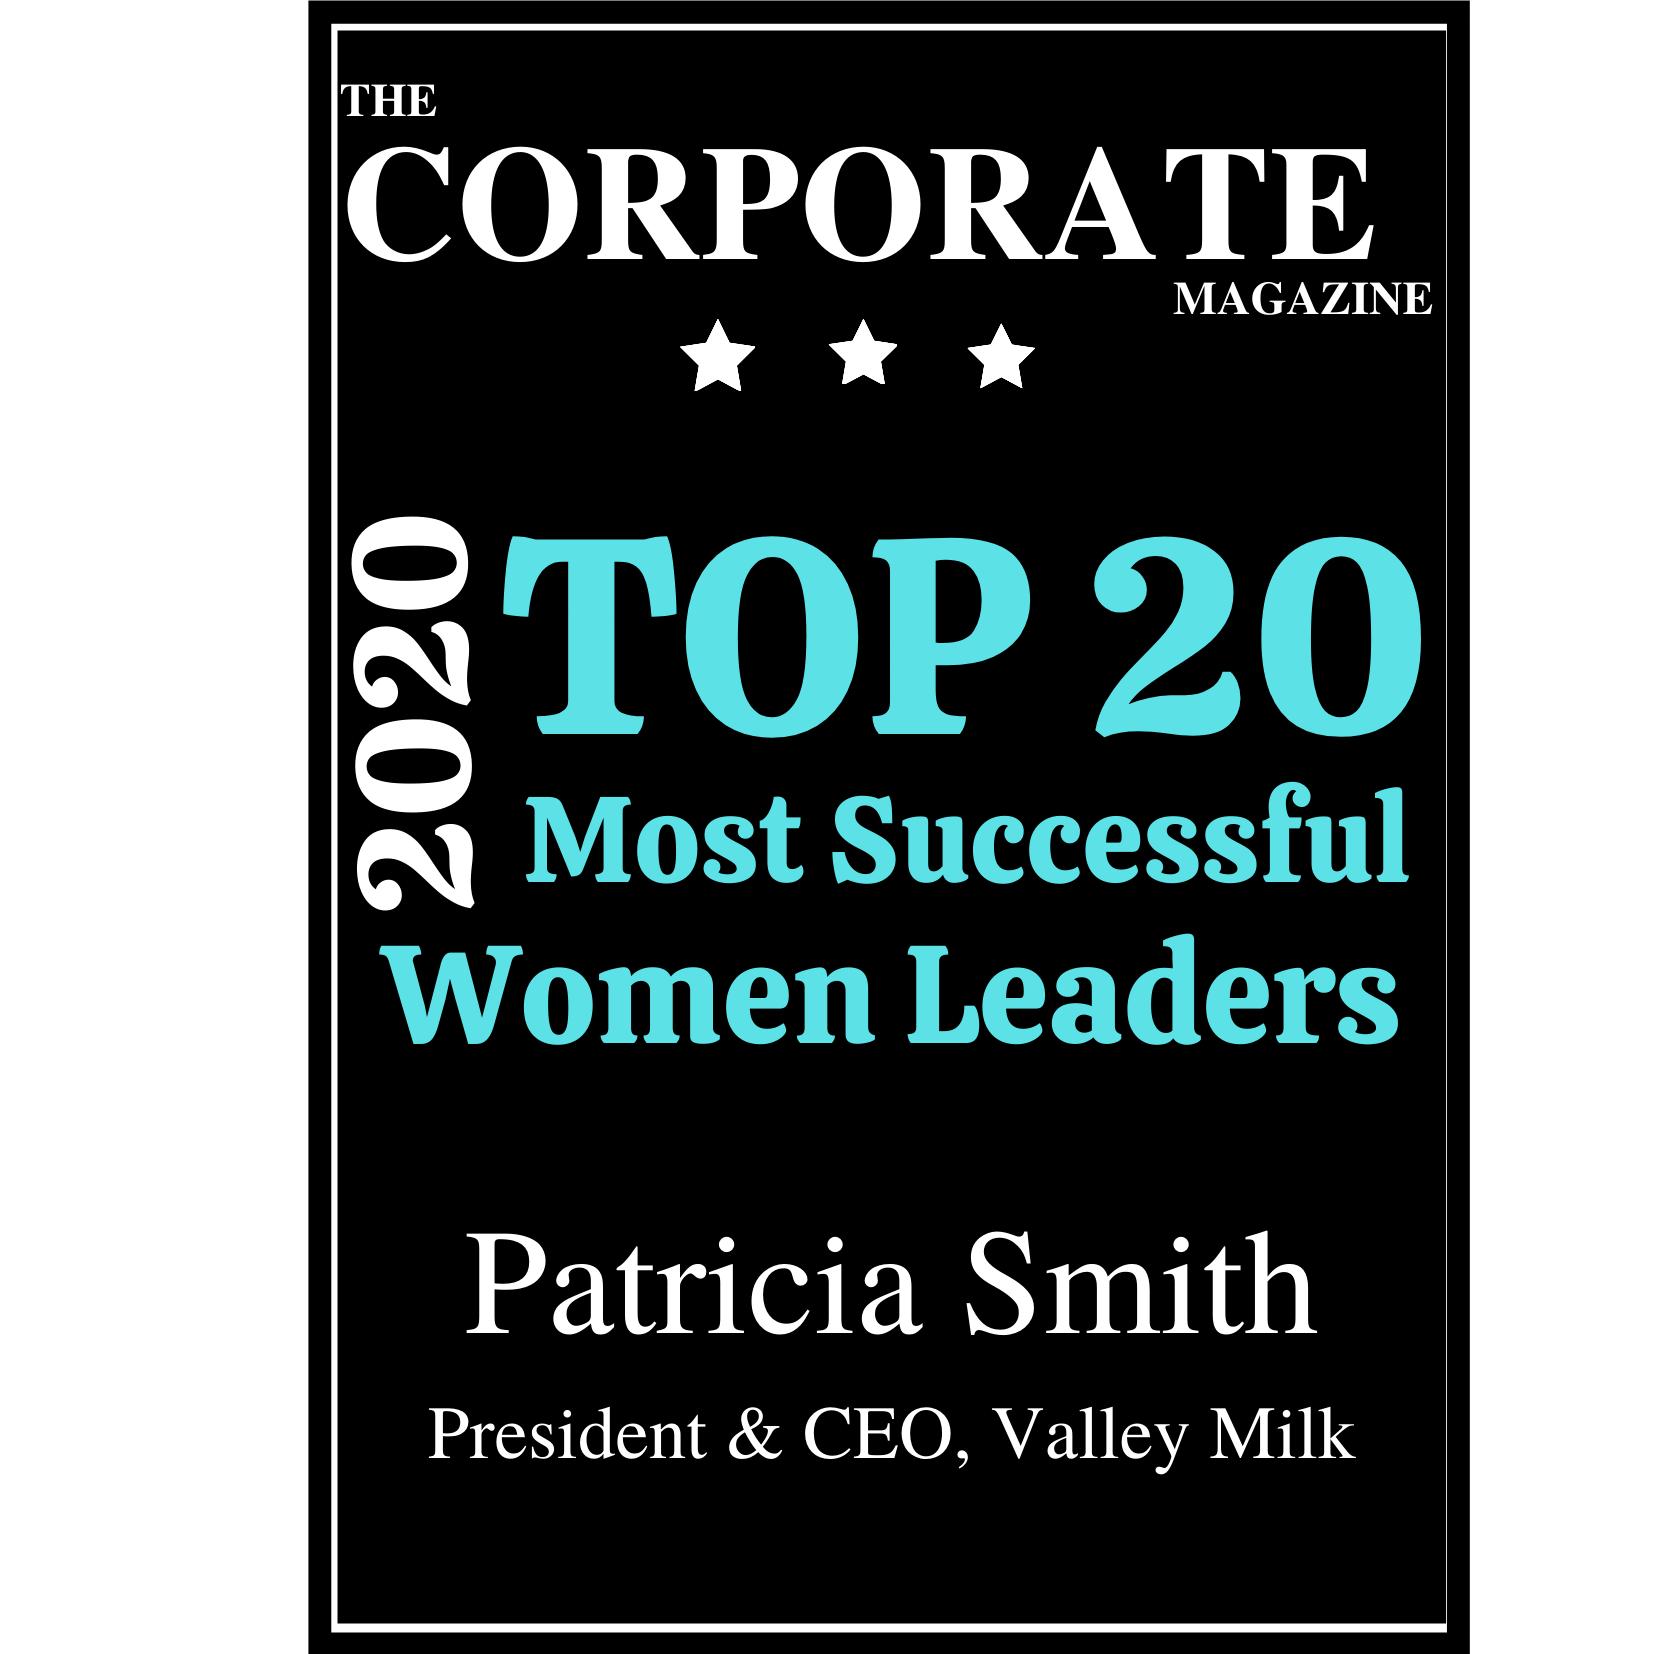 Patricia Smith Magazine for CEOs